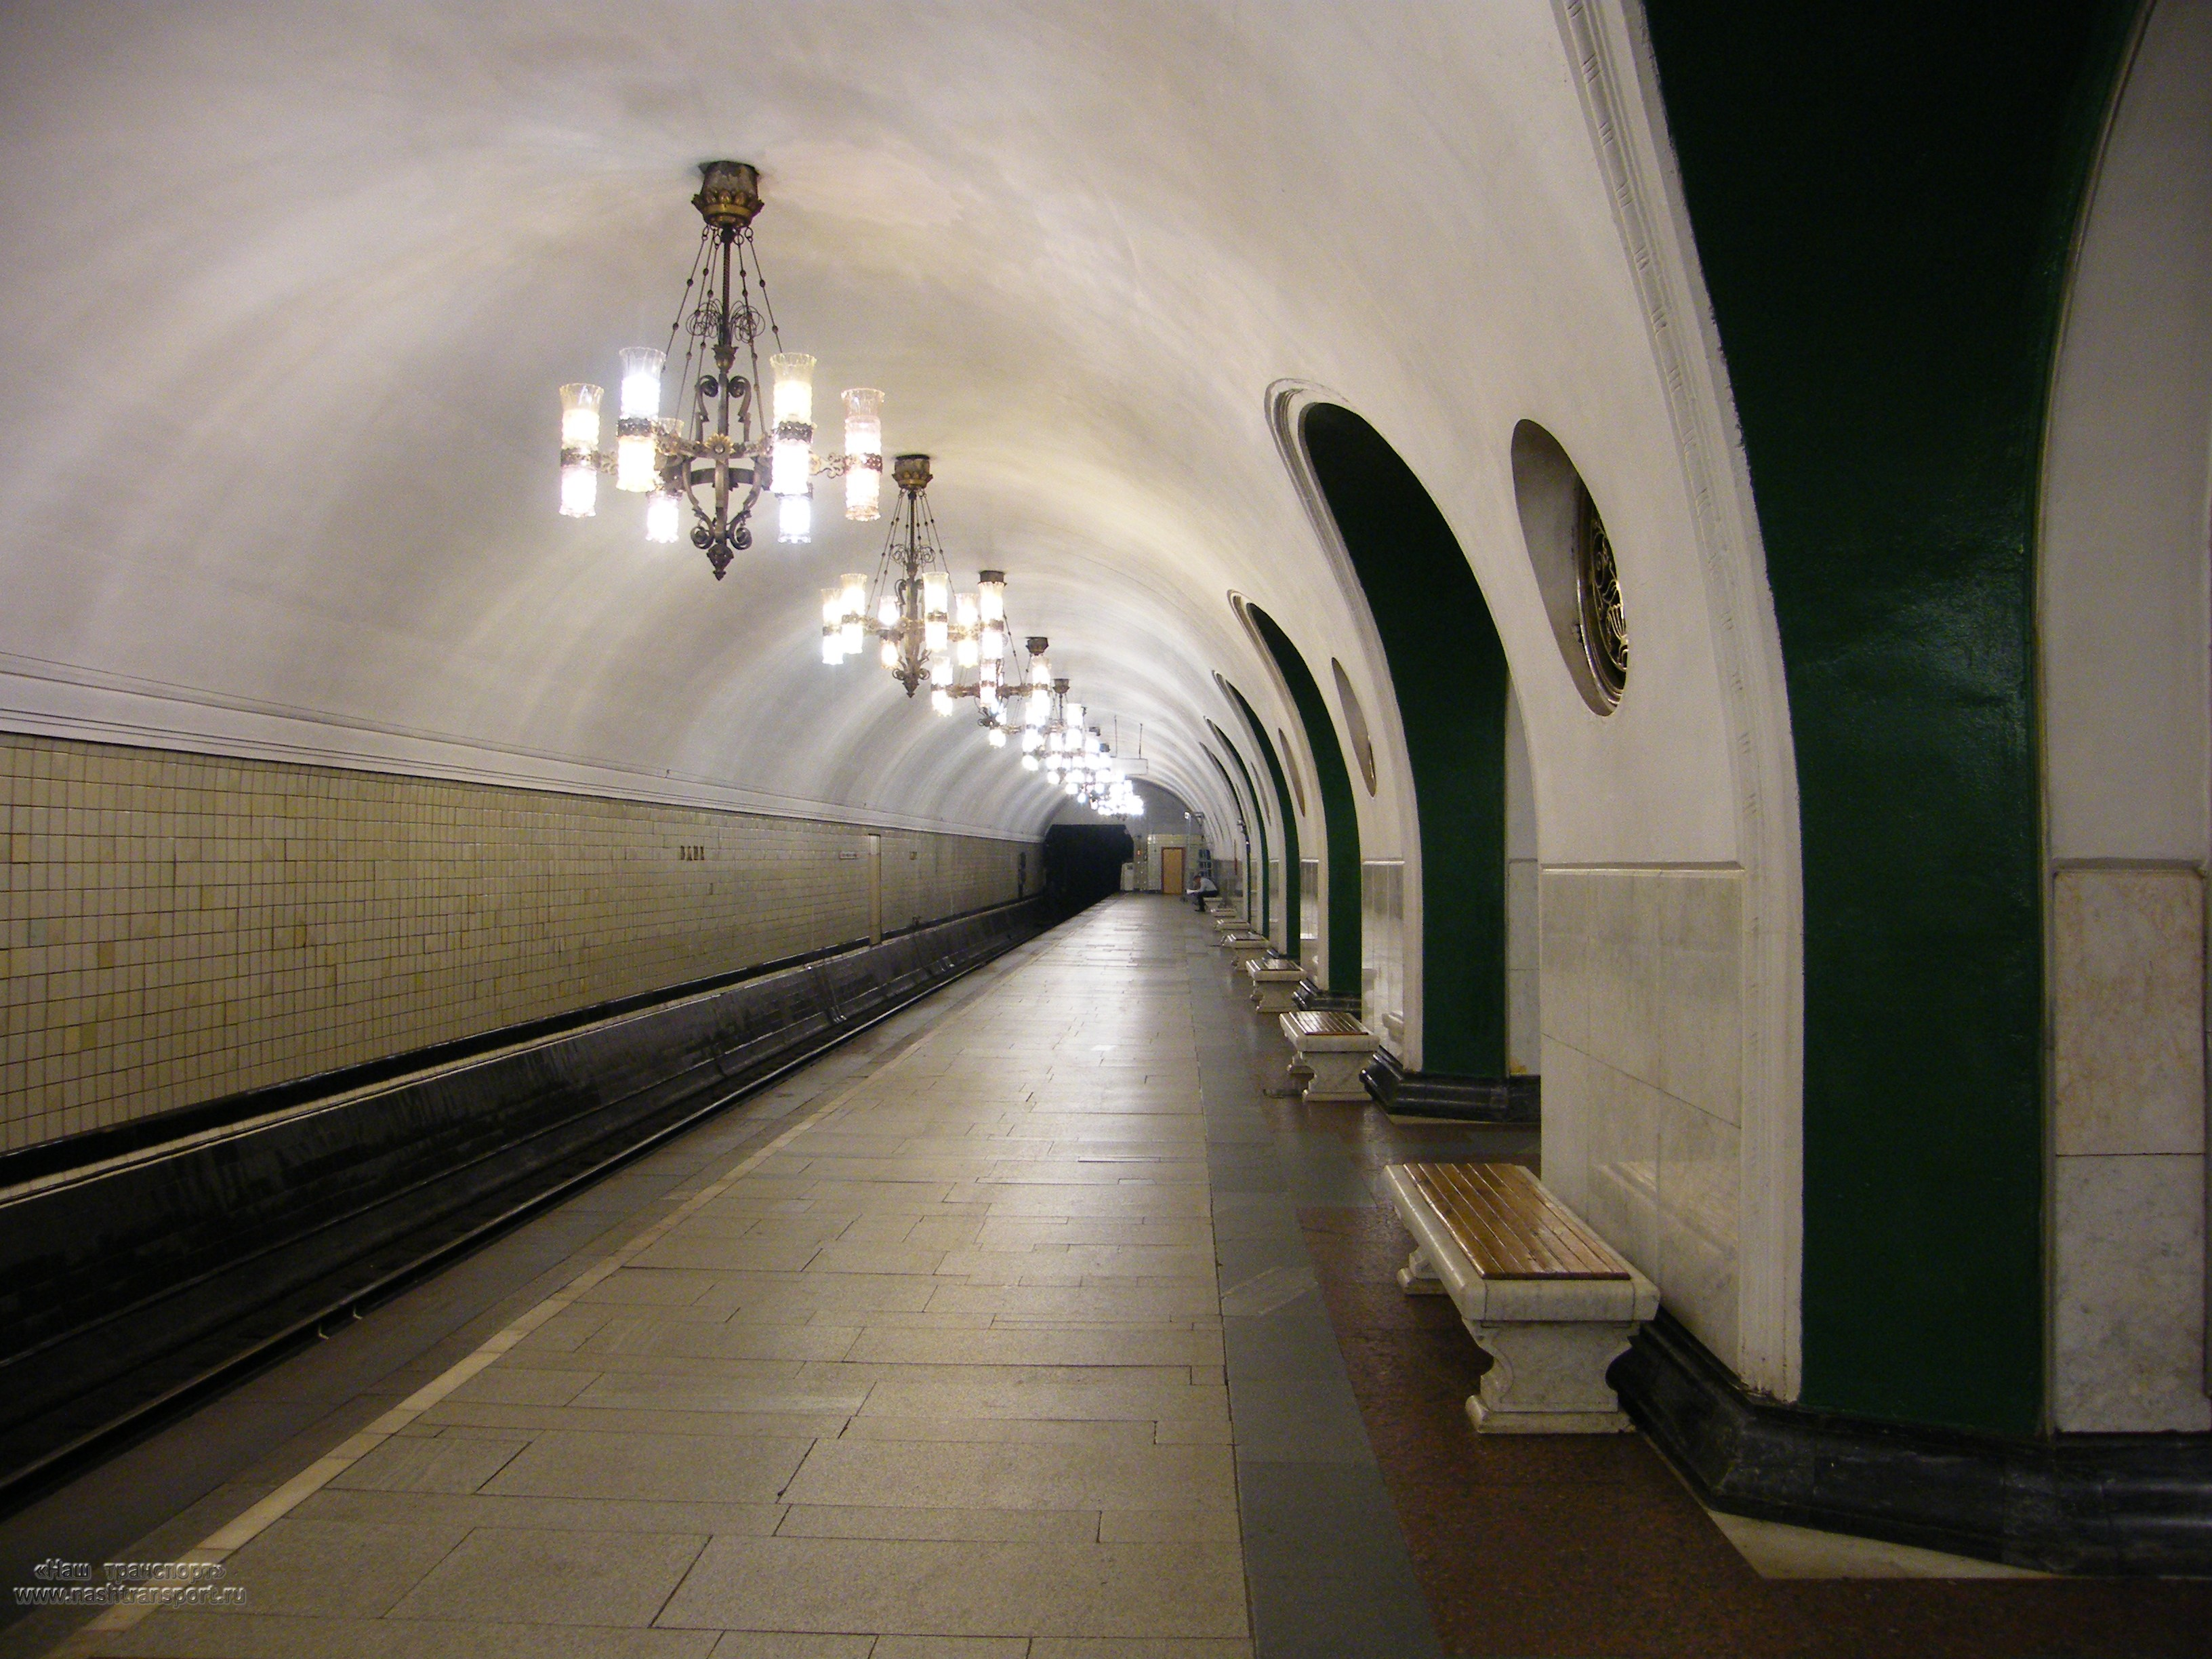 метро вднх москва фото стероиды